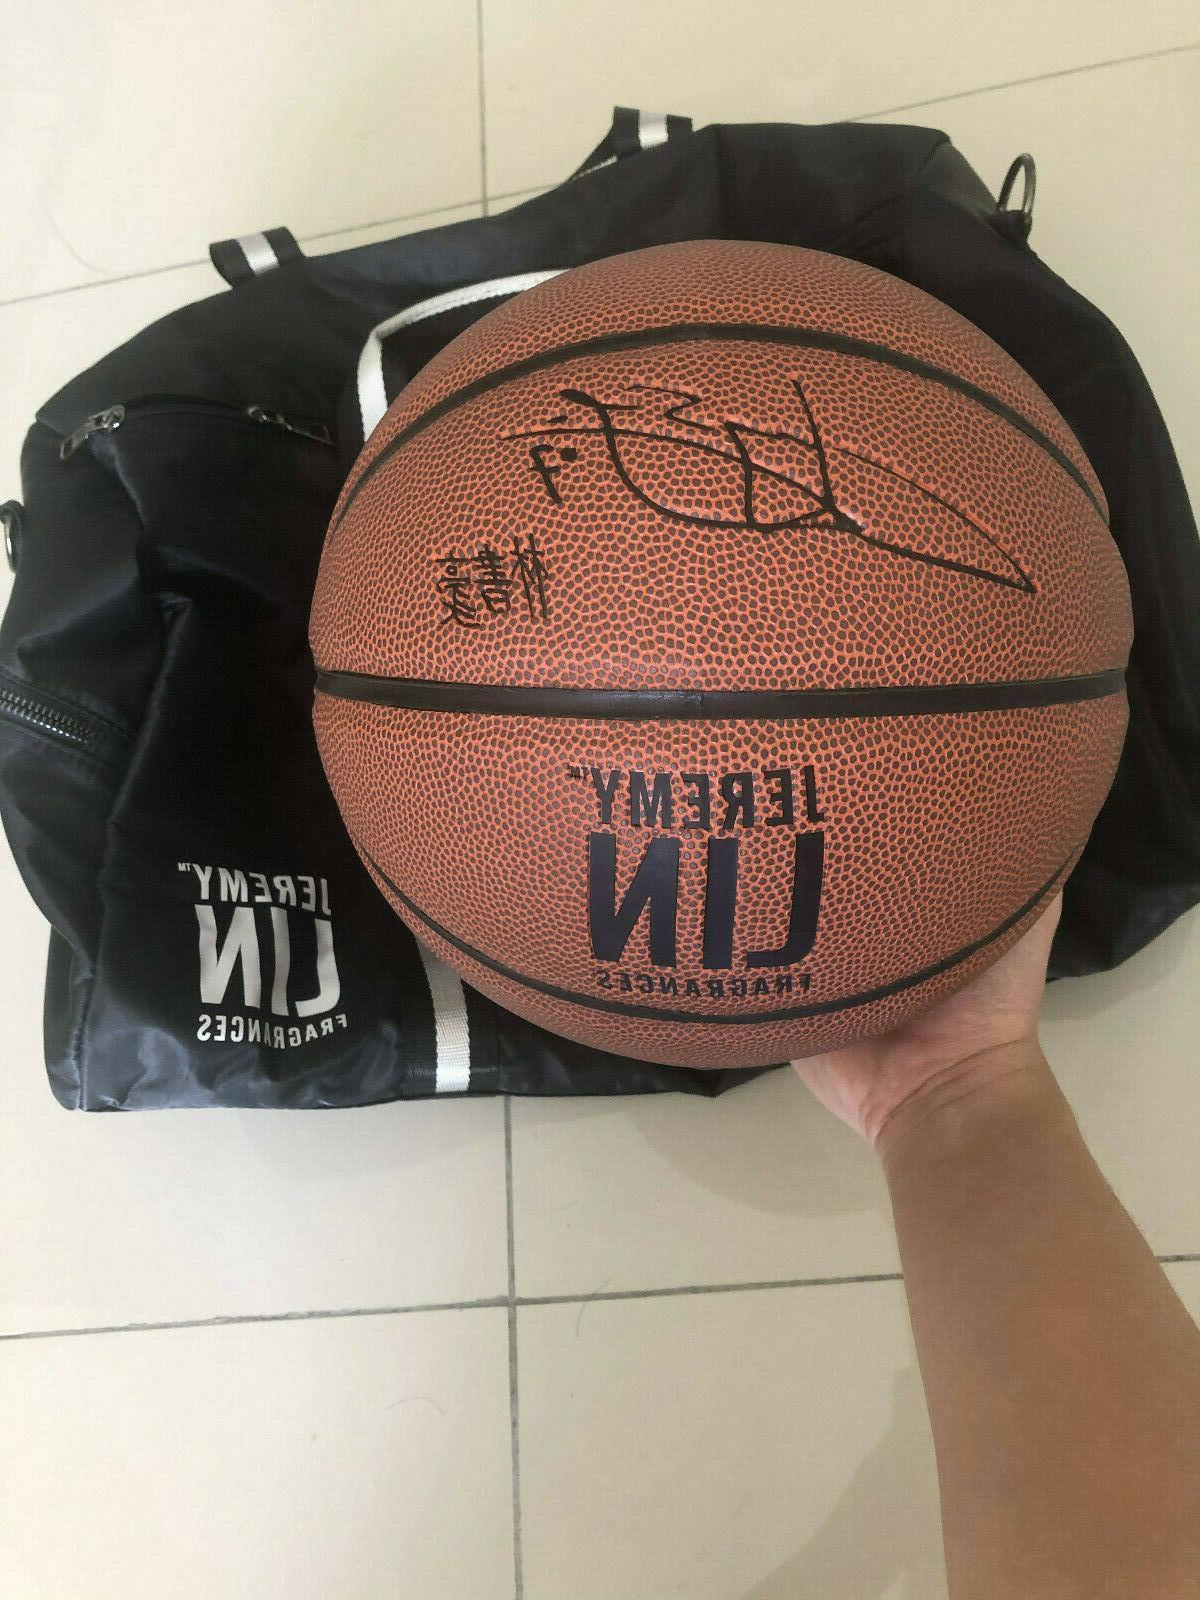 Jeremy LIMITED EDITION Basketball